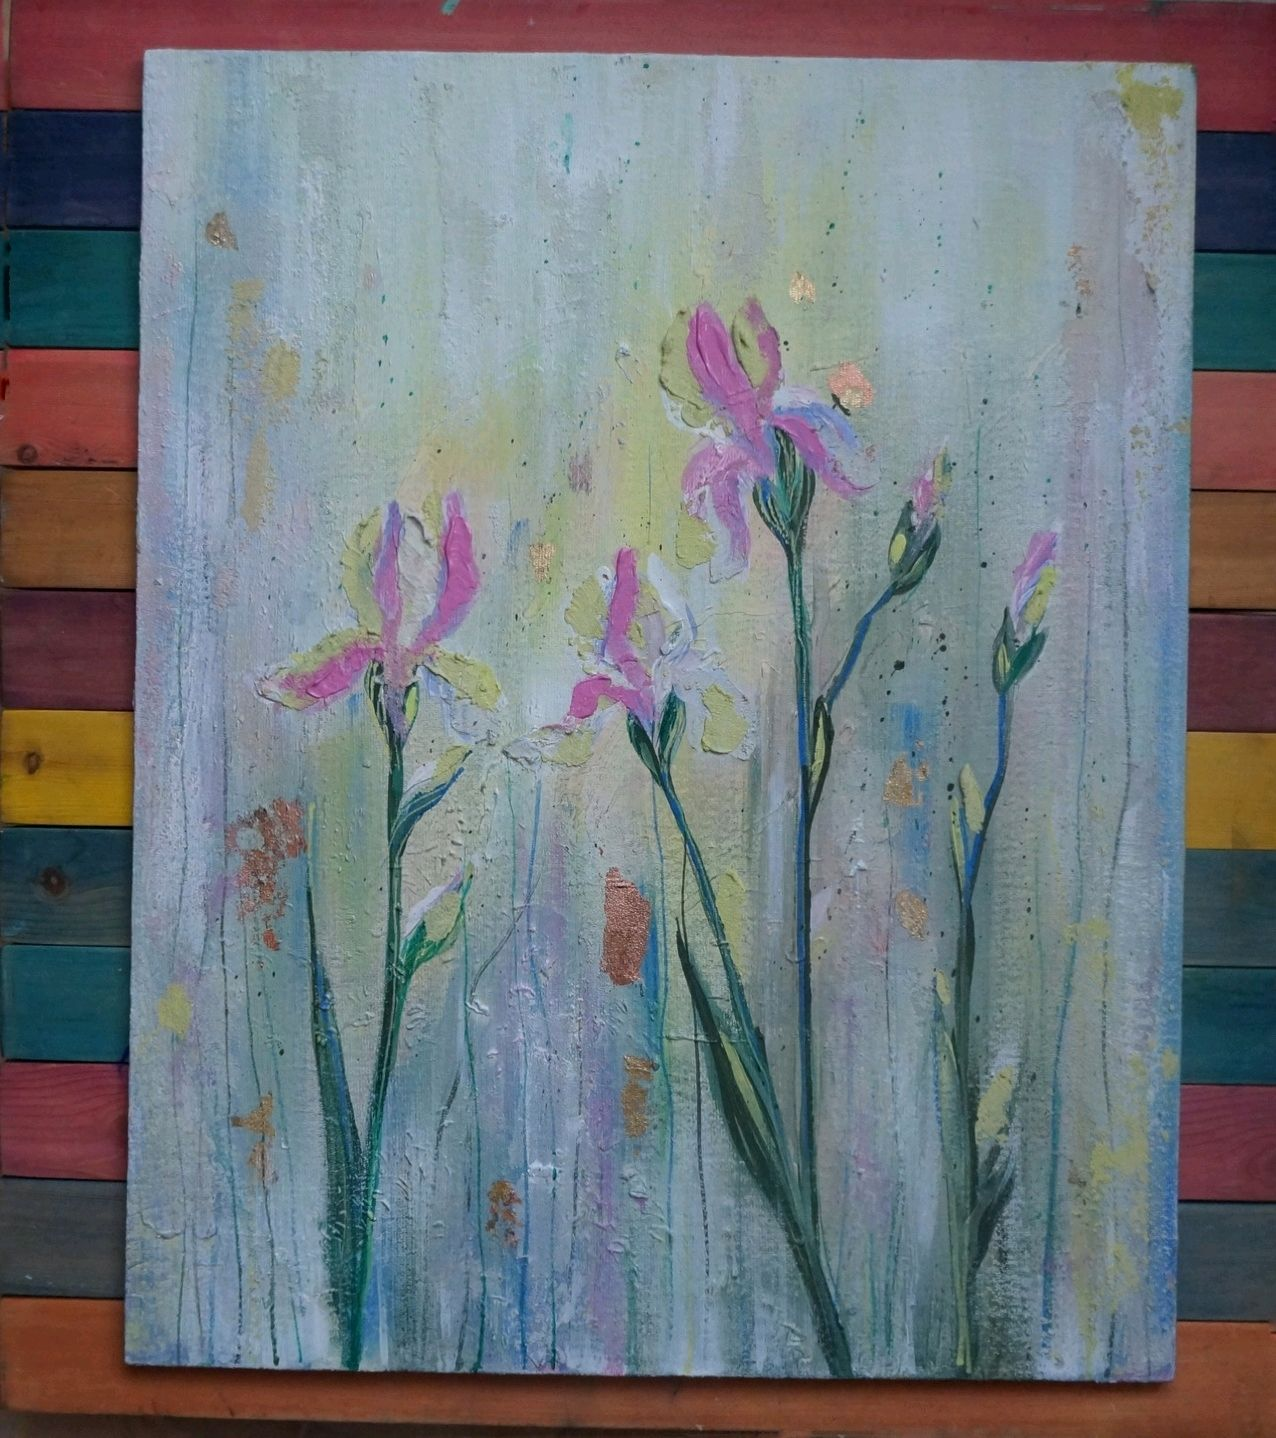 Painting interior 'Gentle irises ', Pictures, Kemerovo,  Фото №1